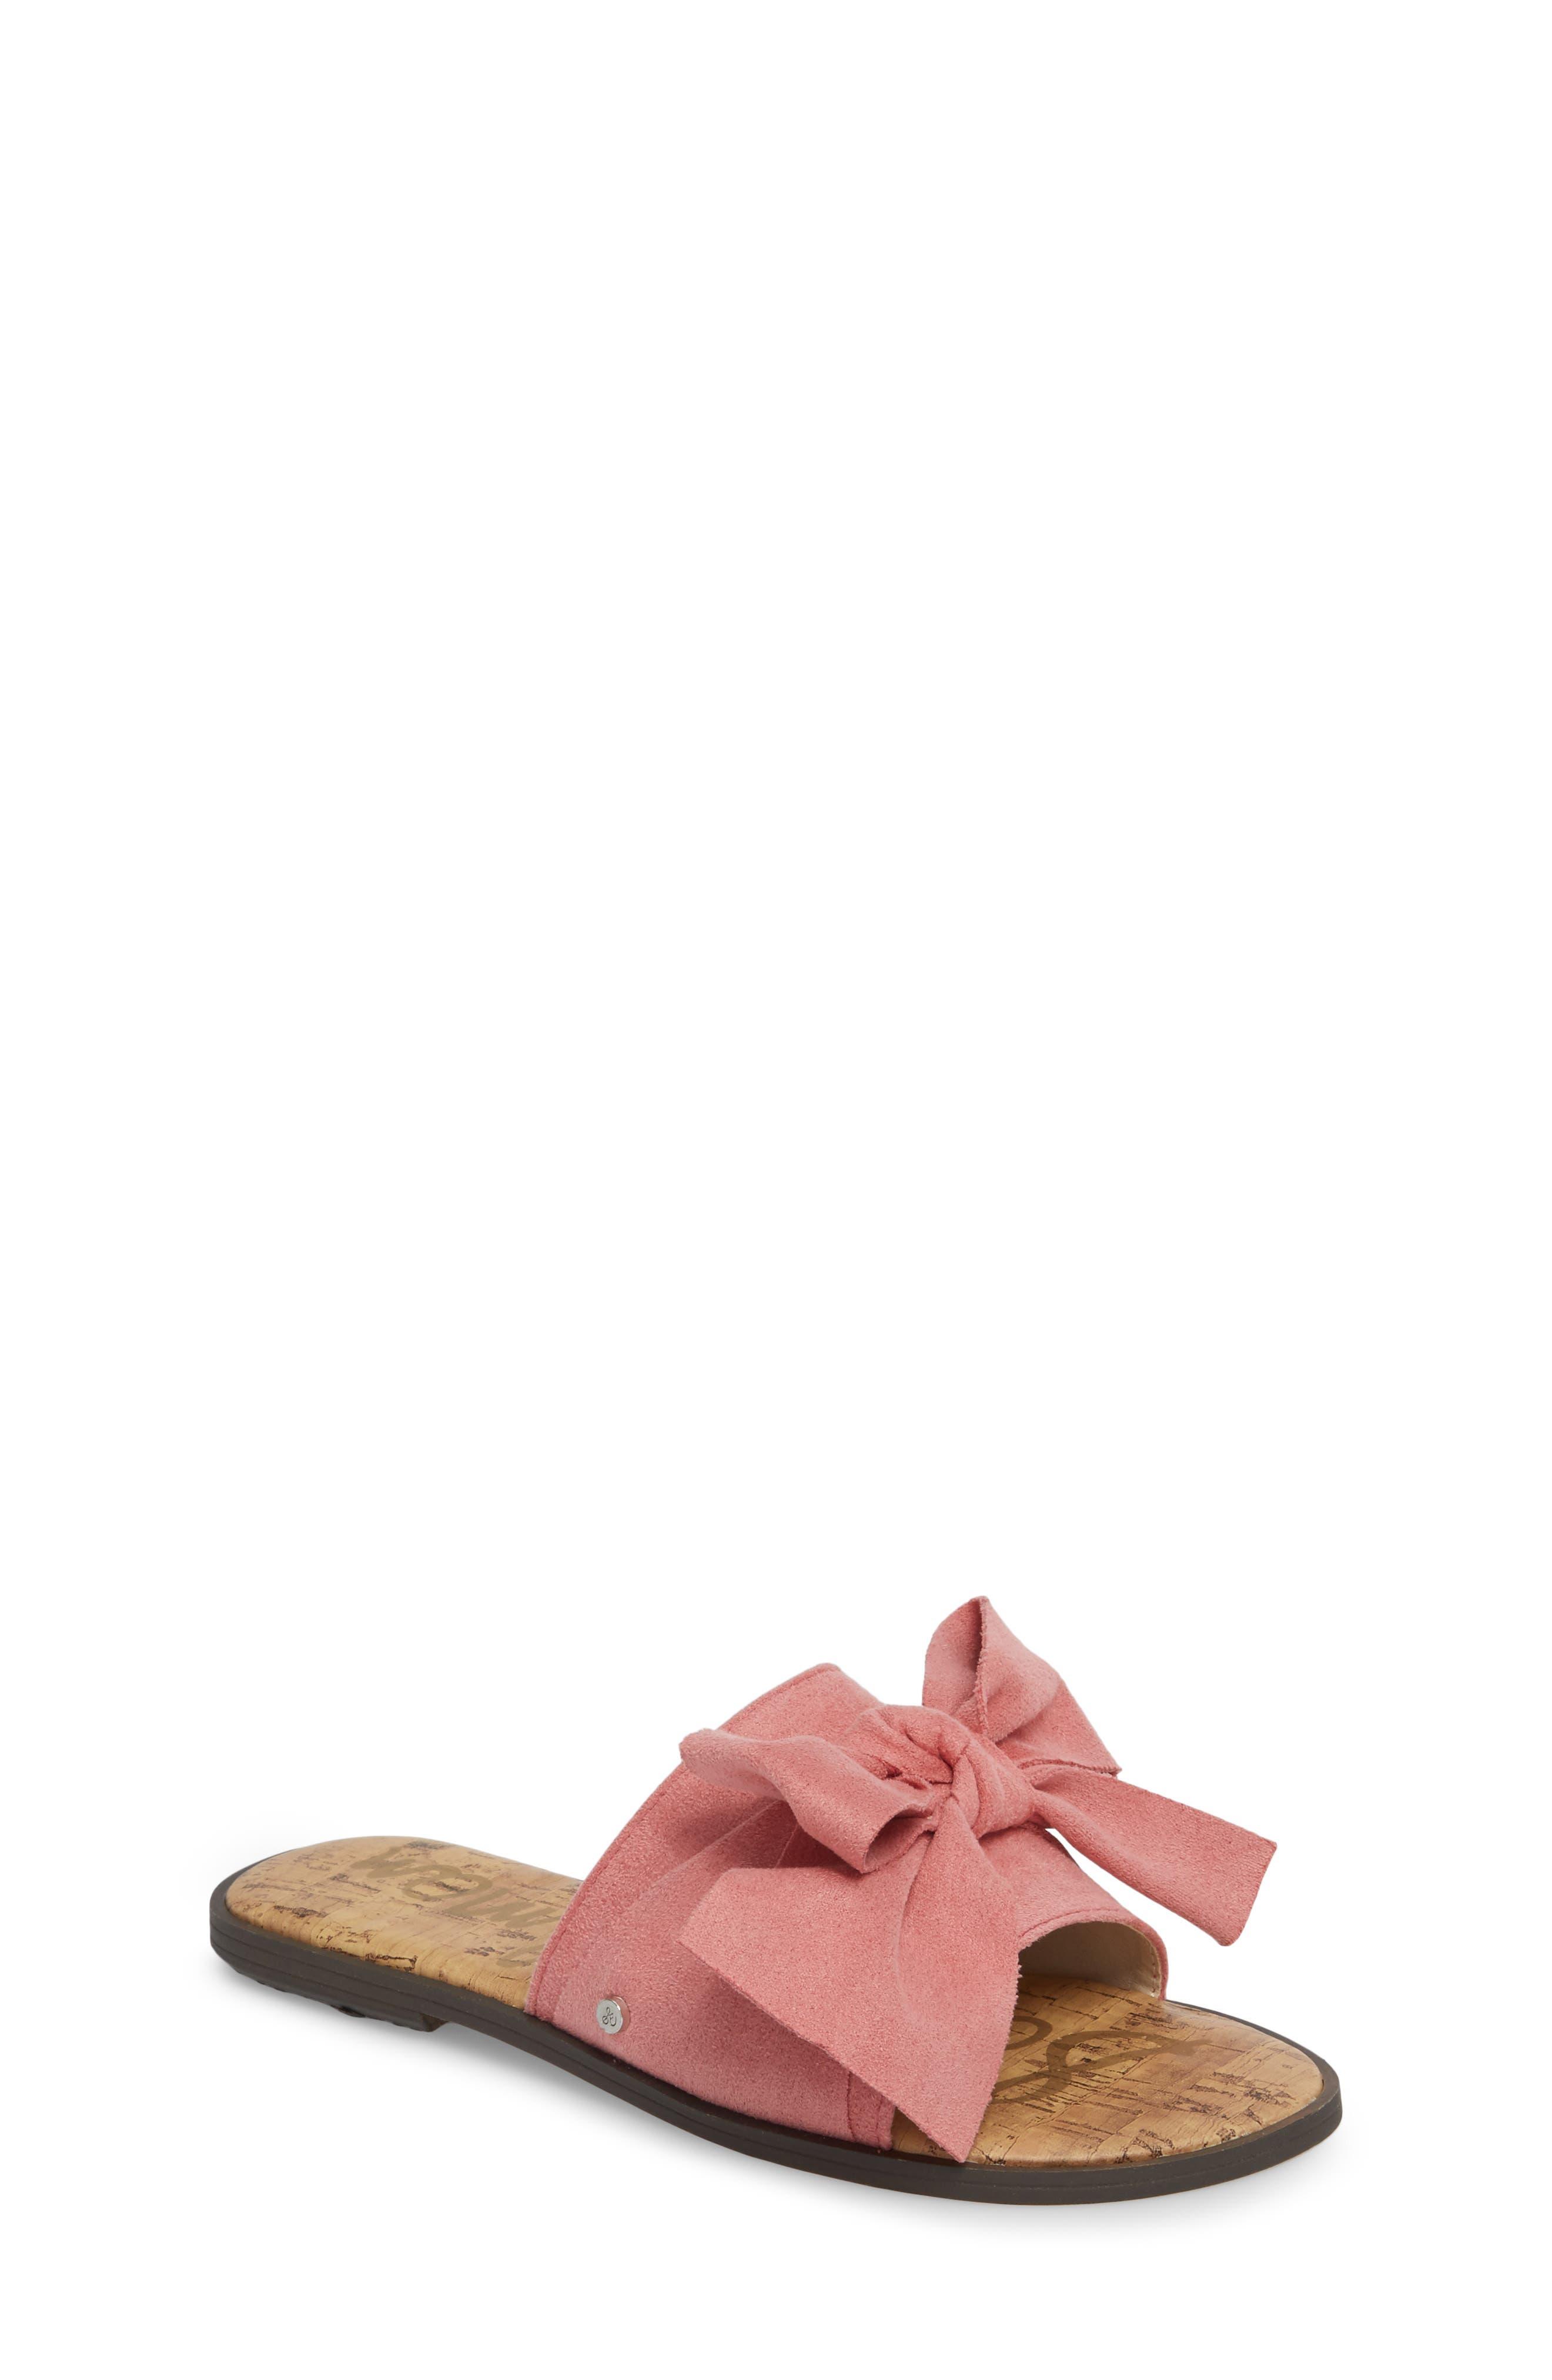 Gigi Bow Faux Leather Sandal,                             Main thumbnail 2, color,